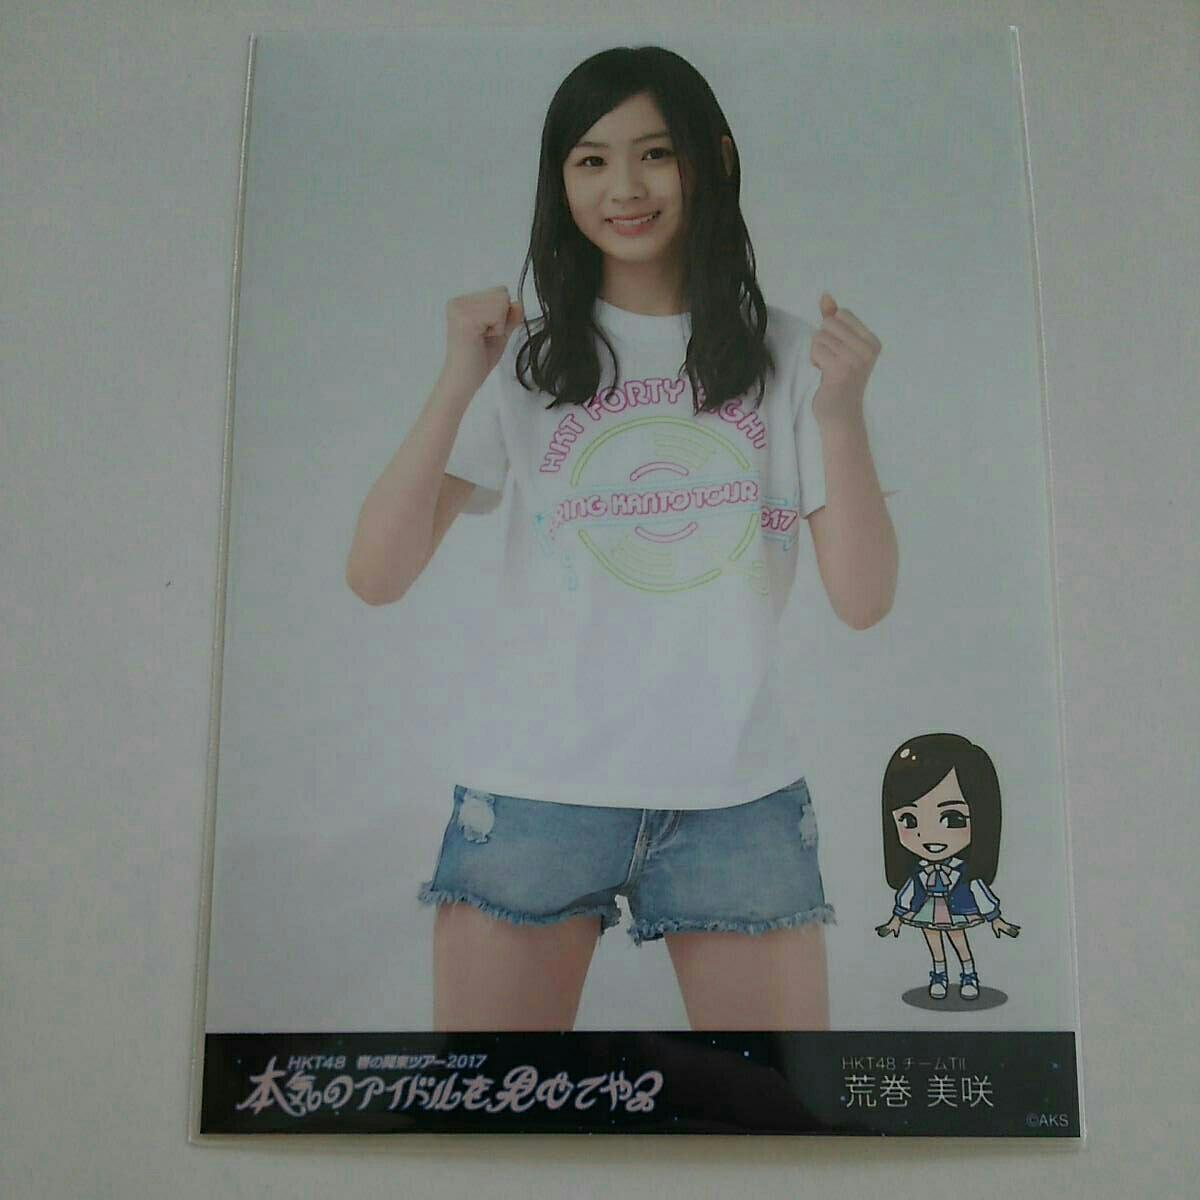 HKT48 荒巻美咲 春の関東ツアー DVD/BD 封入 特典 生写真 ~本気のアイドルを見せてやる~ ライブグッズの画像